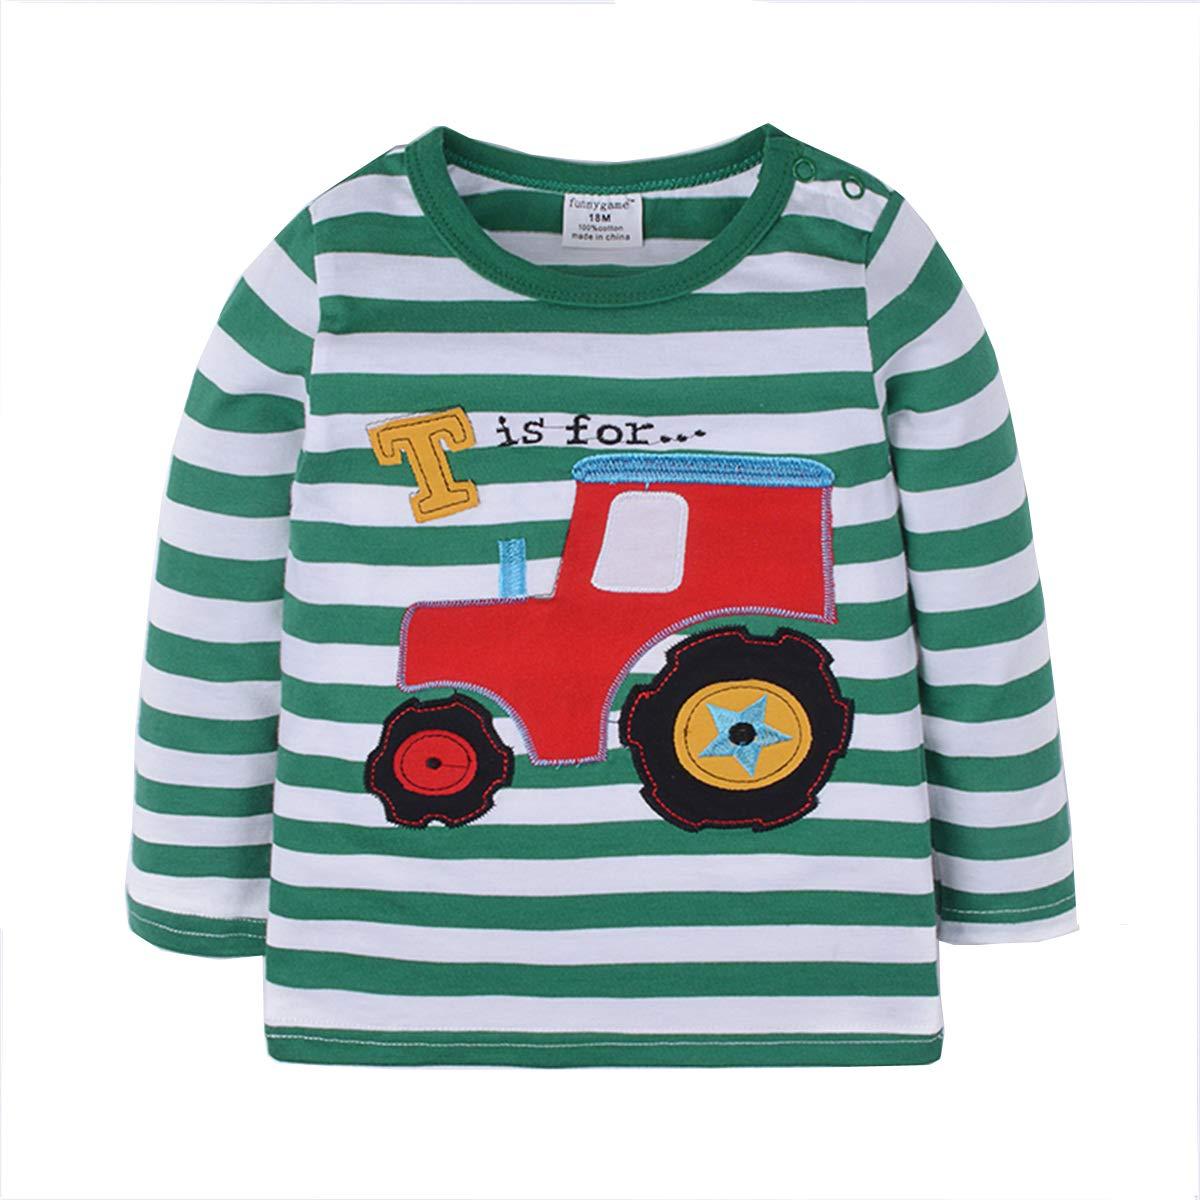 Kids Long Sleeve T-Shirt Boys Car Tee Shirt Children Print Tops Unisex Clothes Dizoony